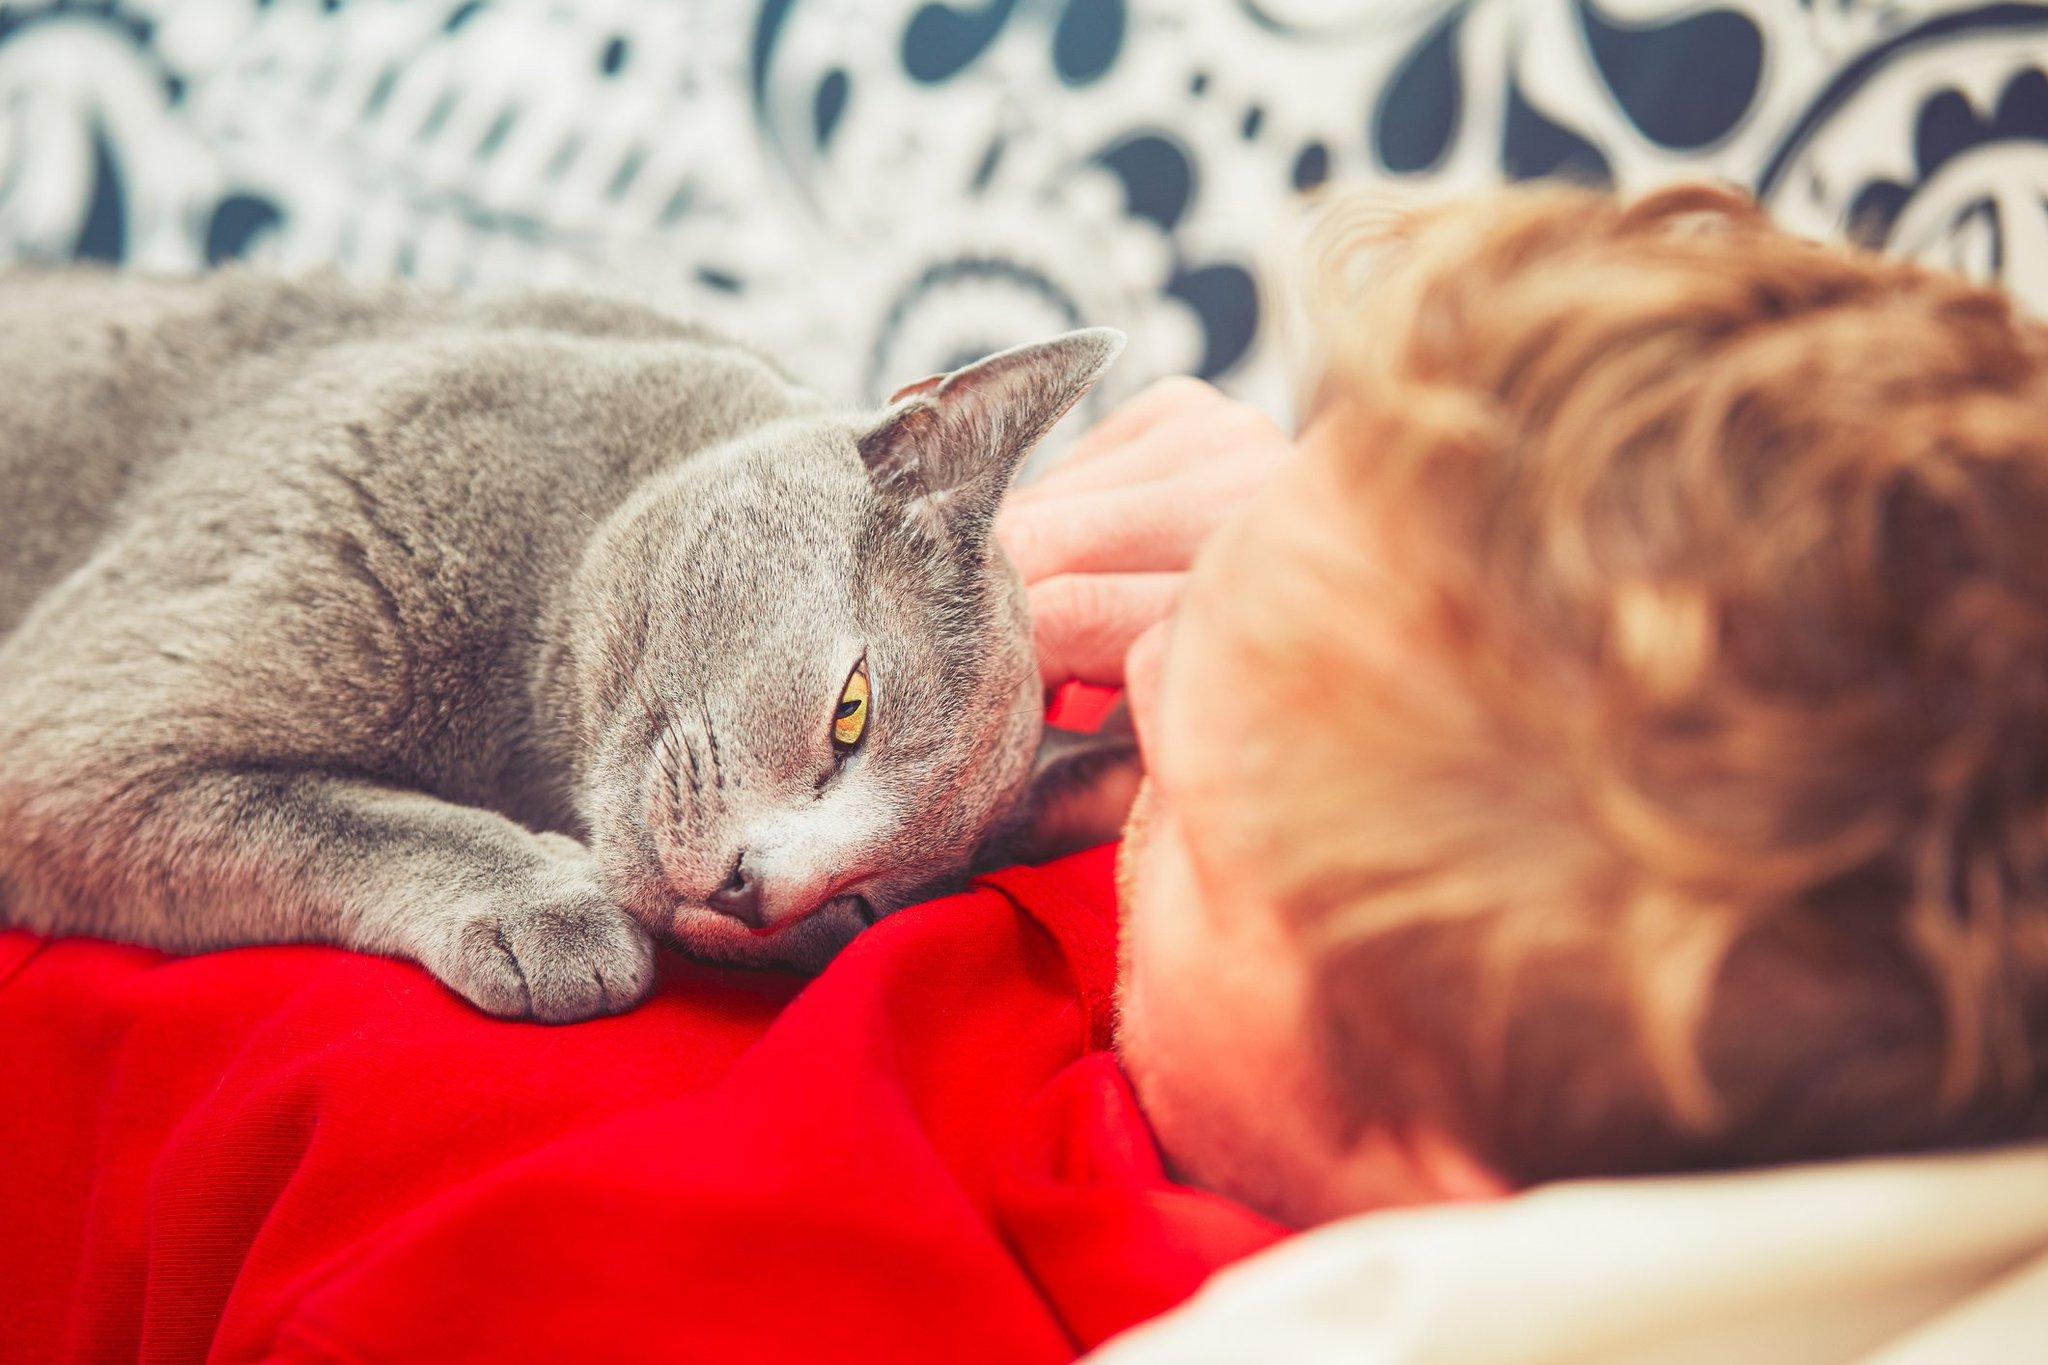 Pisica simte durerea unui om si vine si se aseaza pe locul dureros